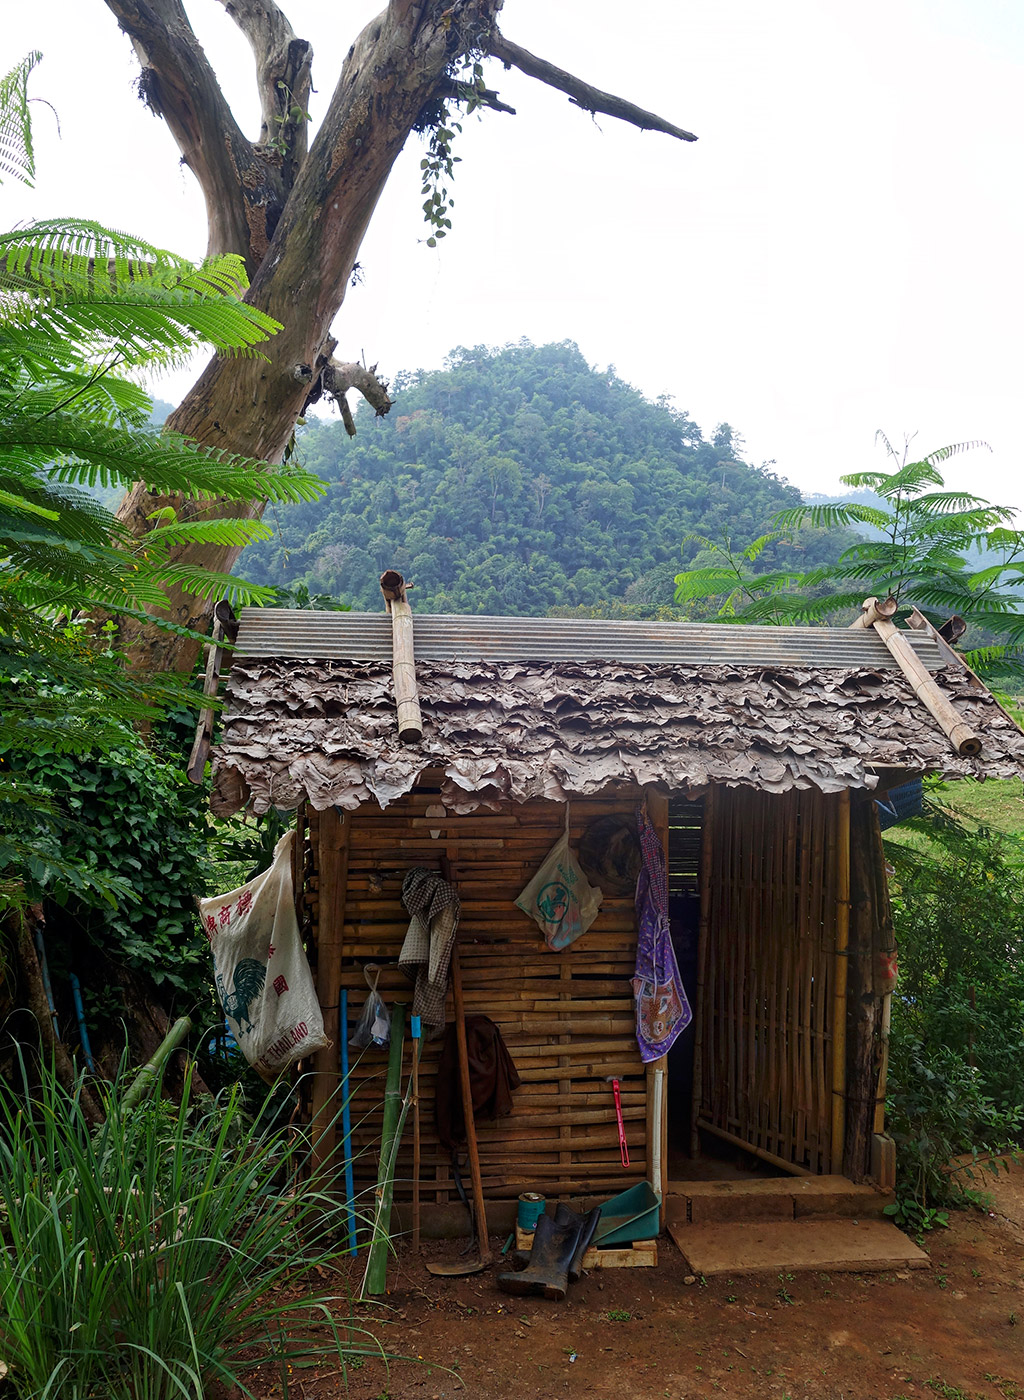 chiang-mai-thailand-elephant-sanctuary-14